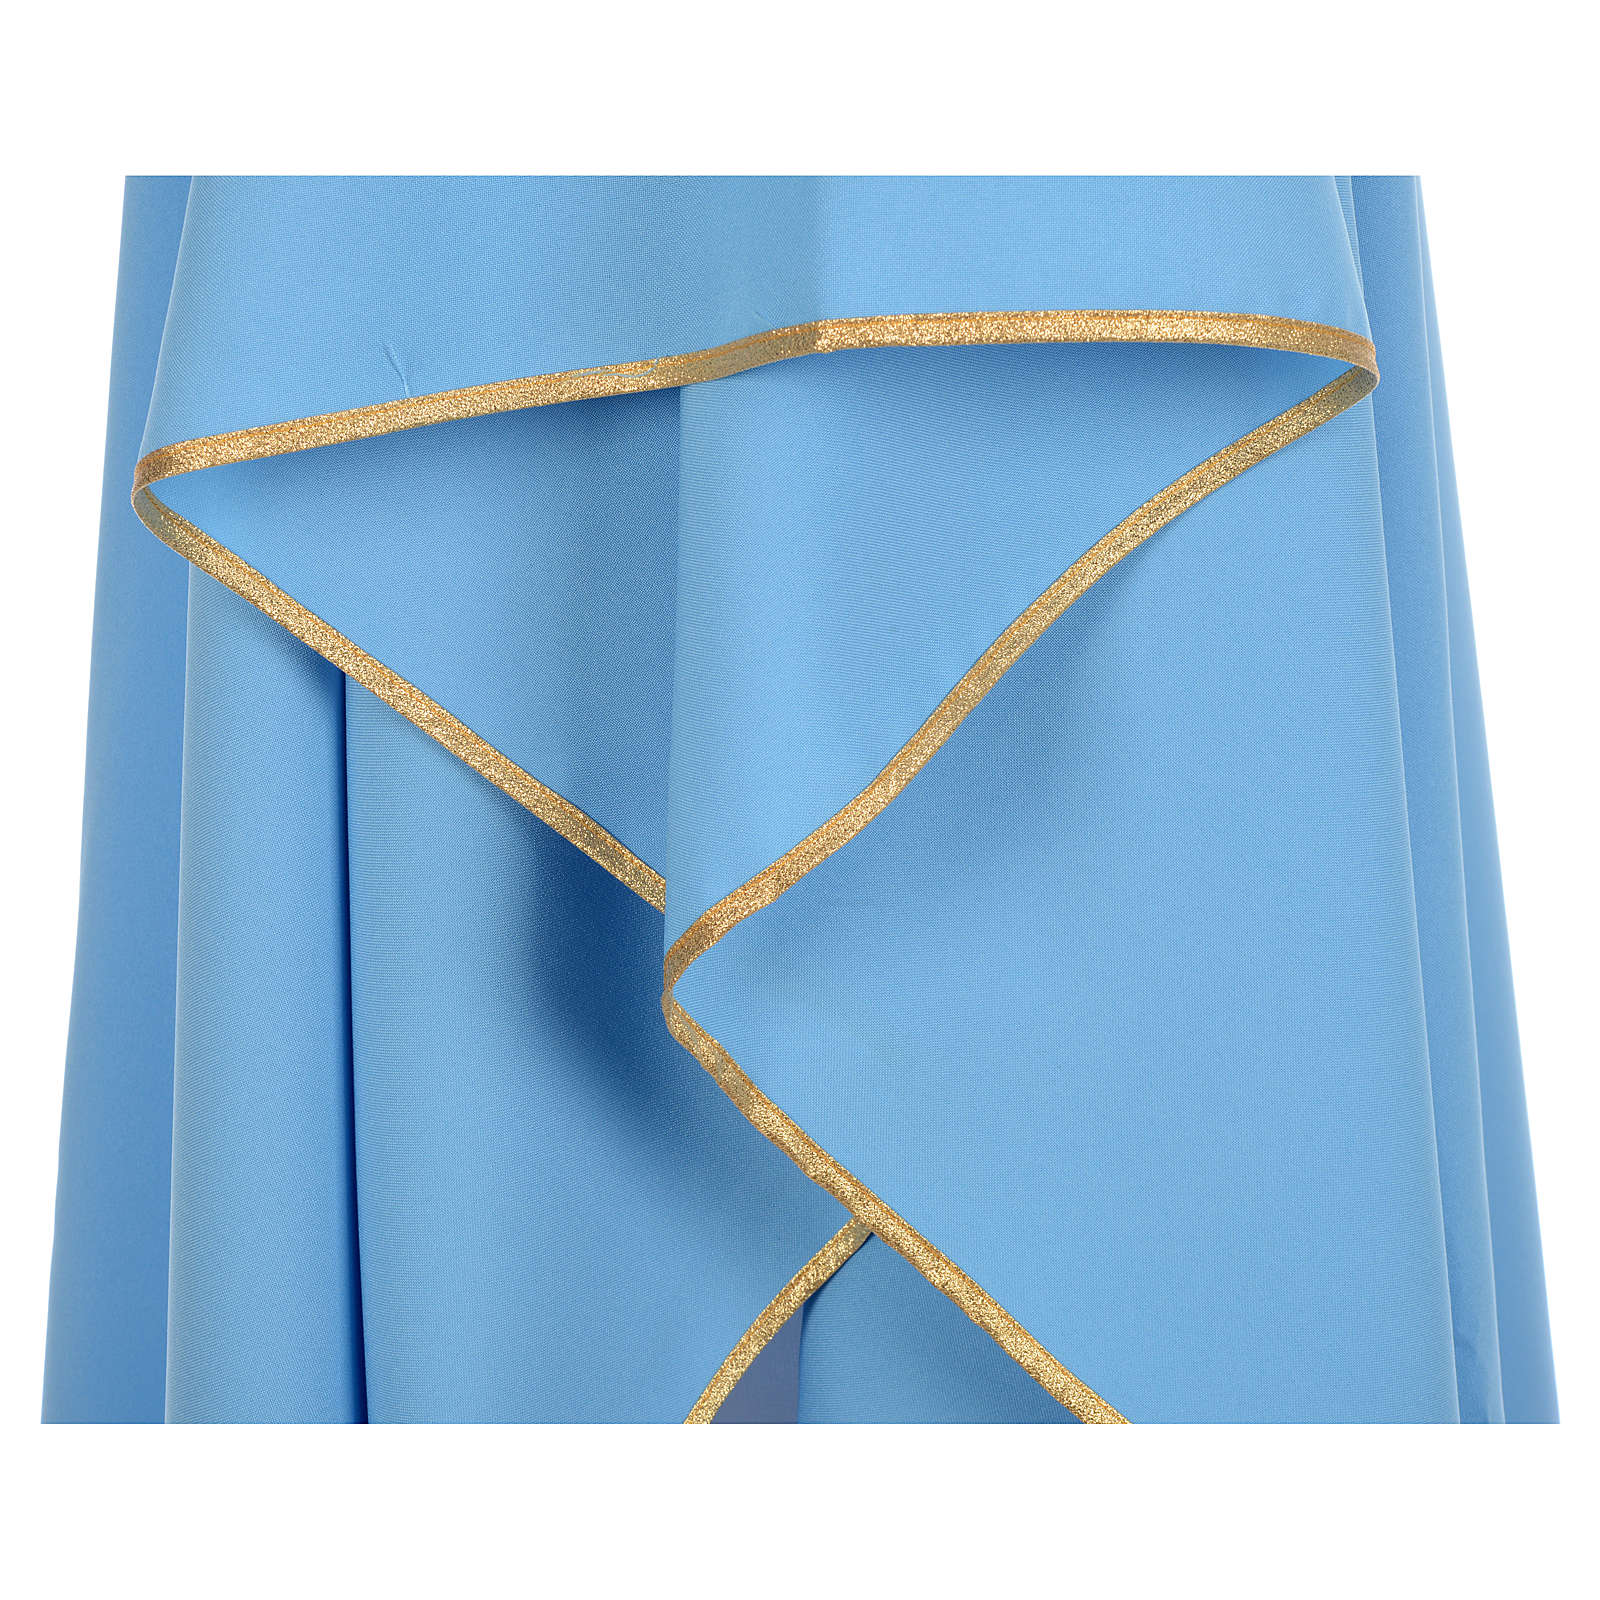 Casula azzurra 100% poliestere lucido XP 4